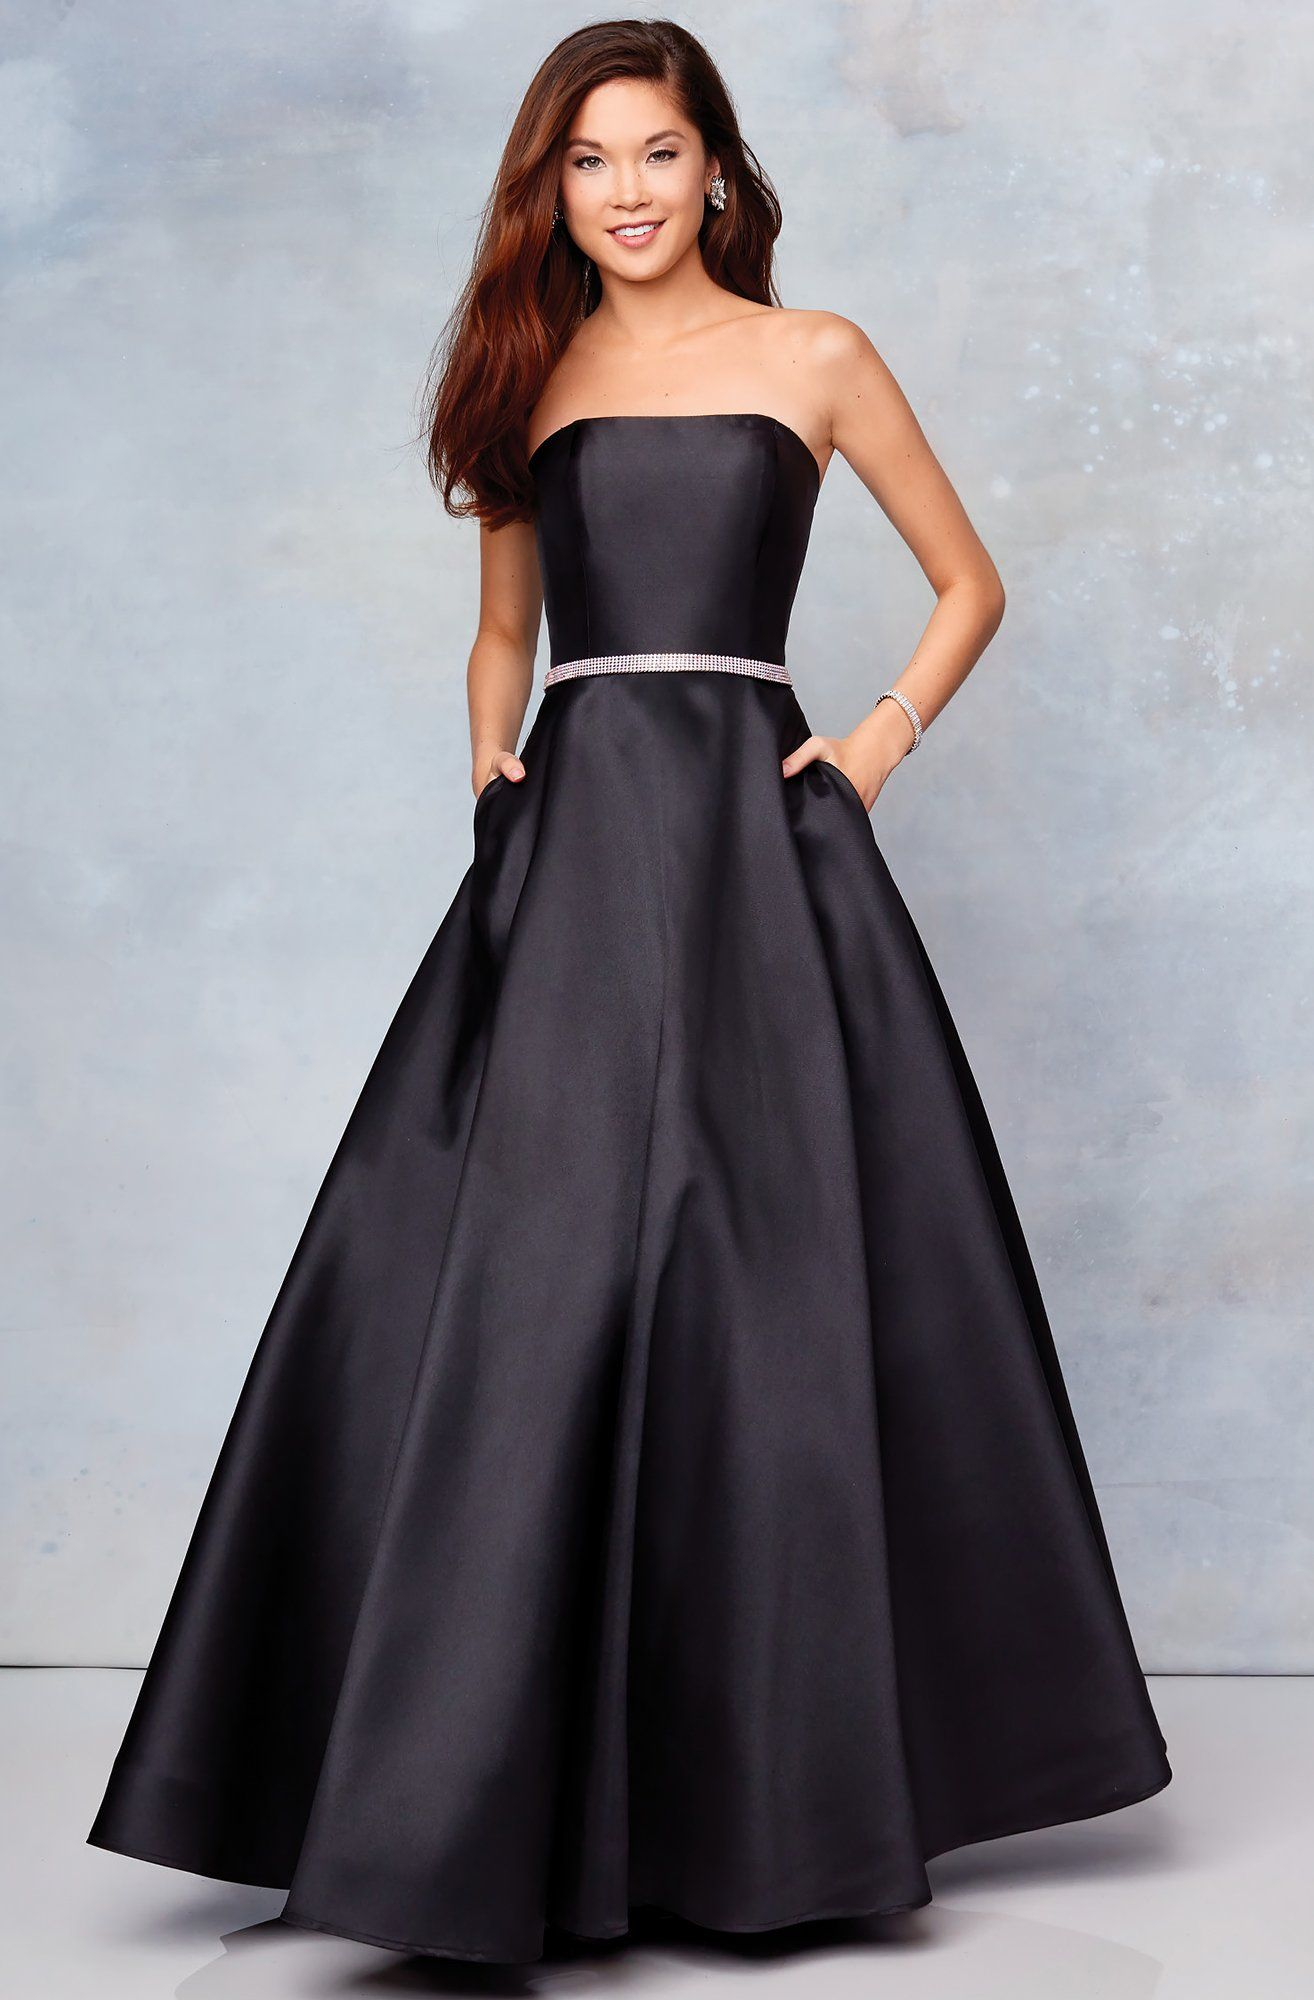 Clarisse 3739 strapless embellished belt mikado prom